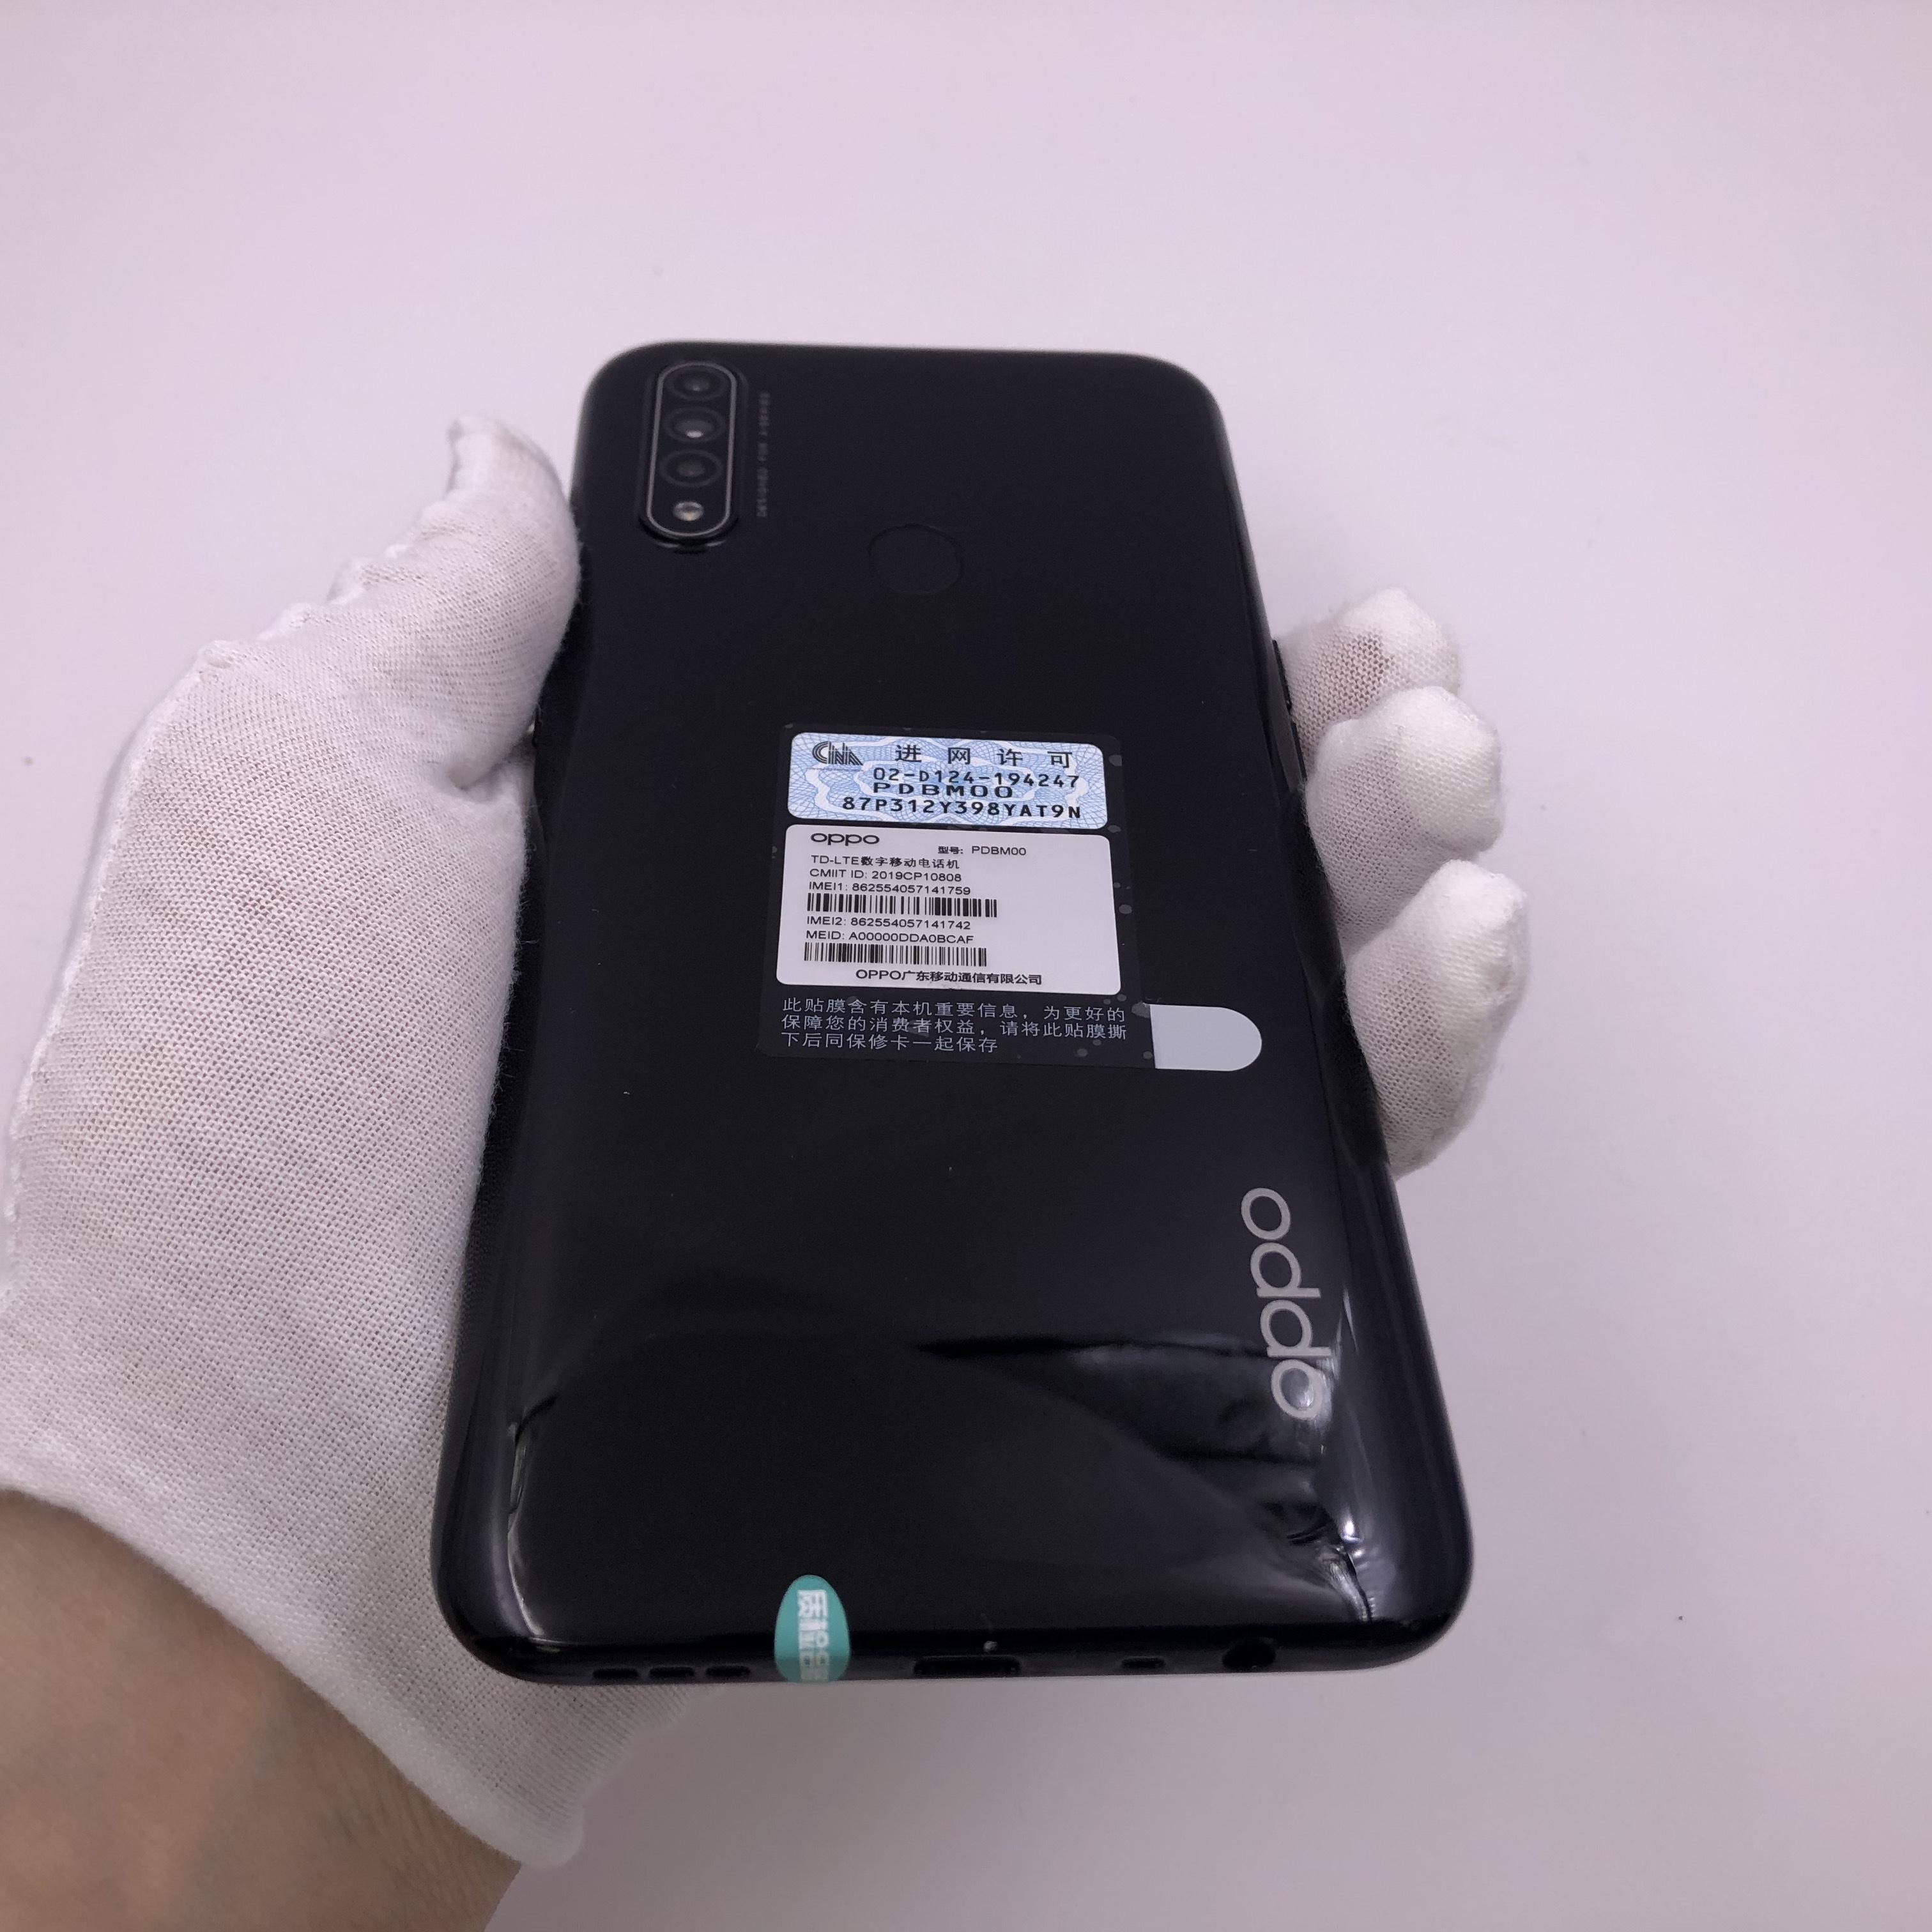 oppo【A8】4G全网通 秘夜黑 4G/64G 国行 95新